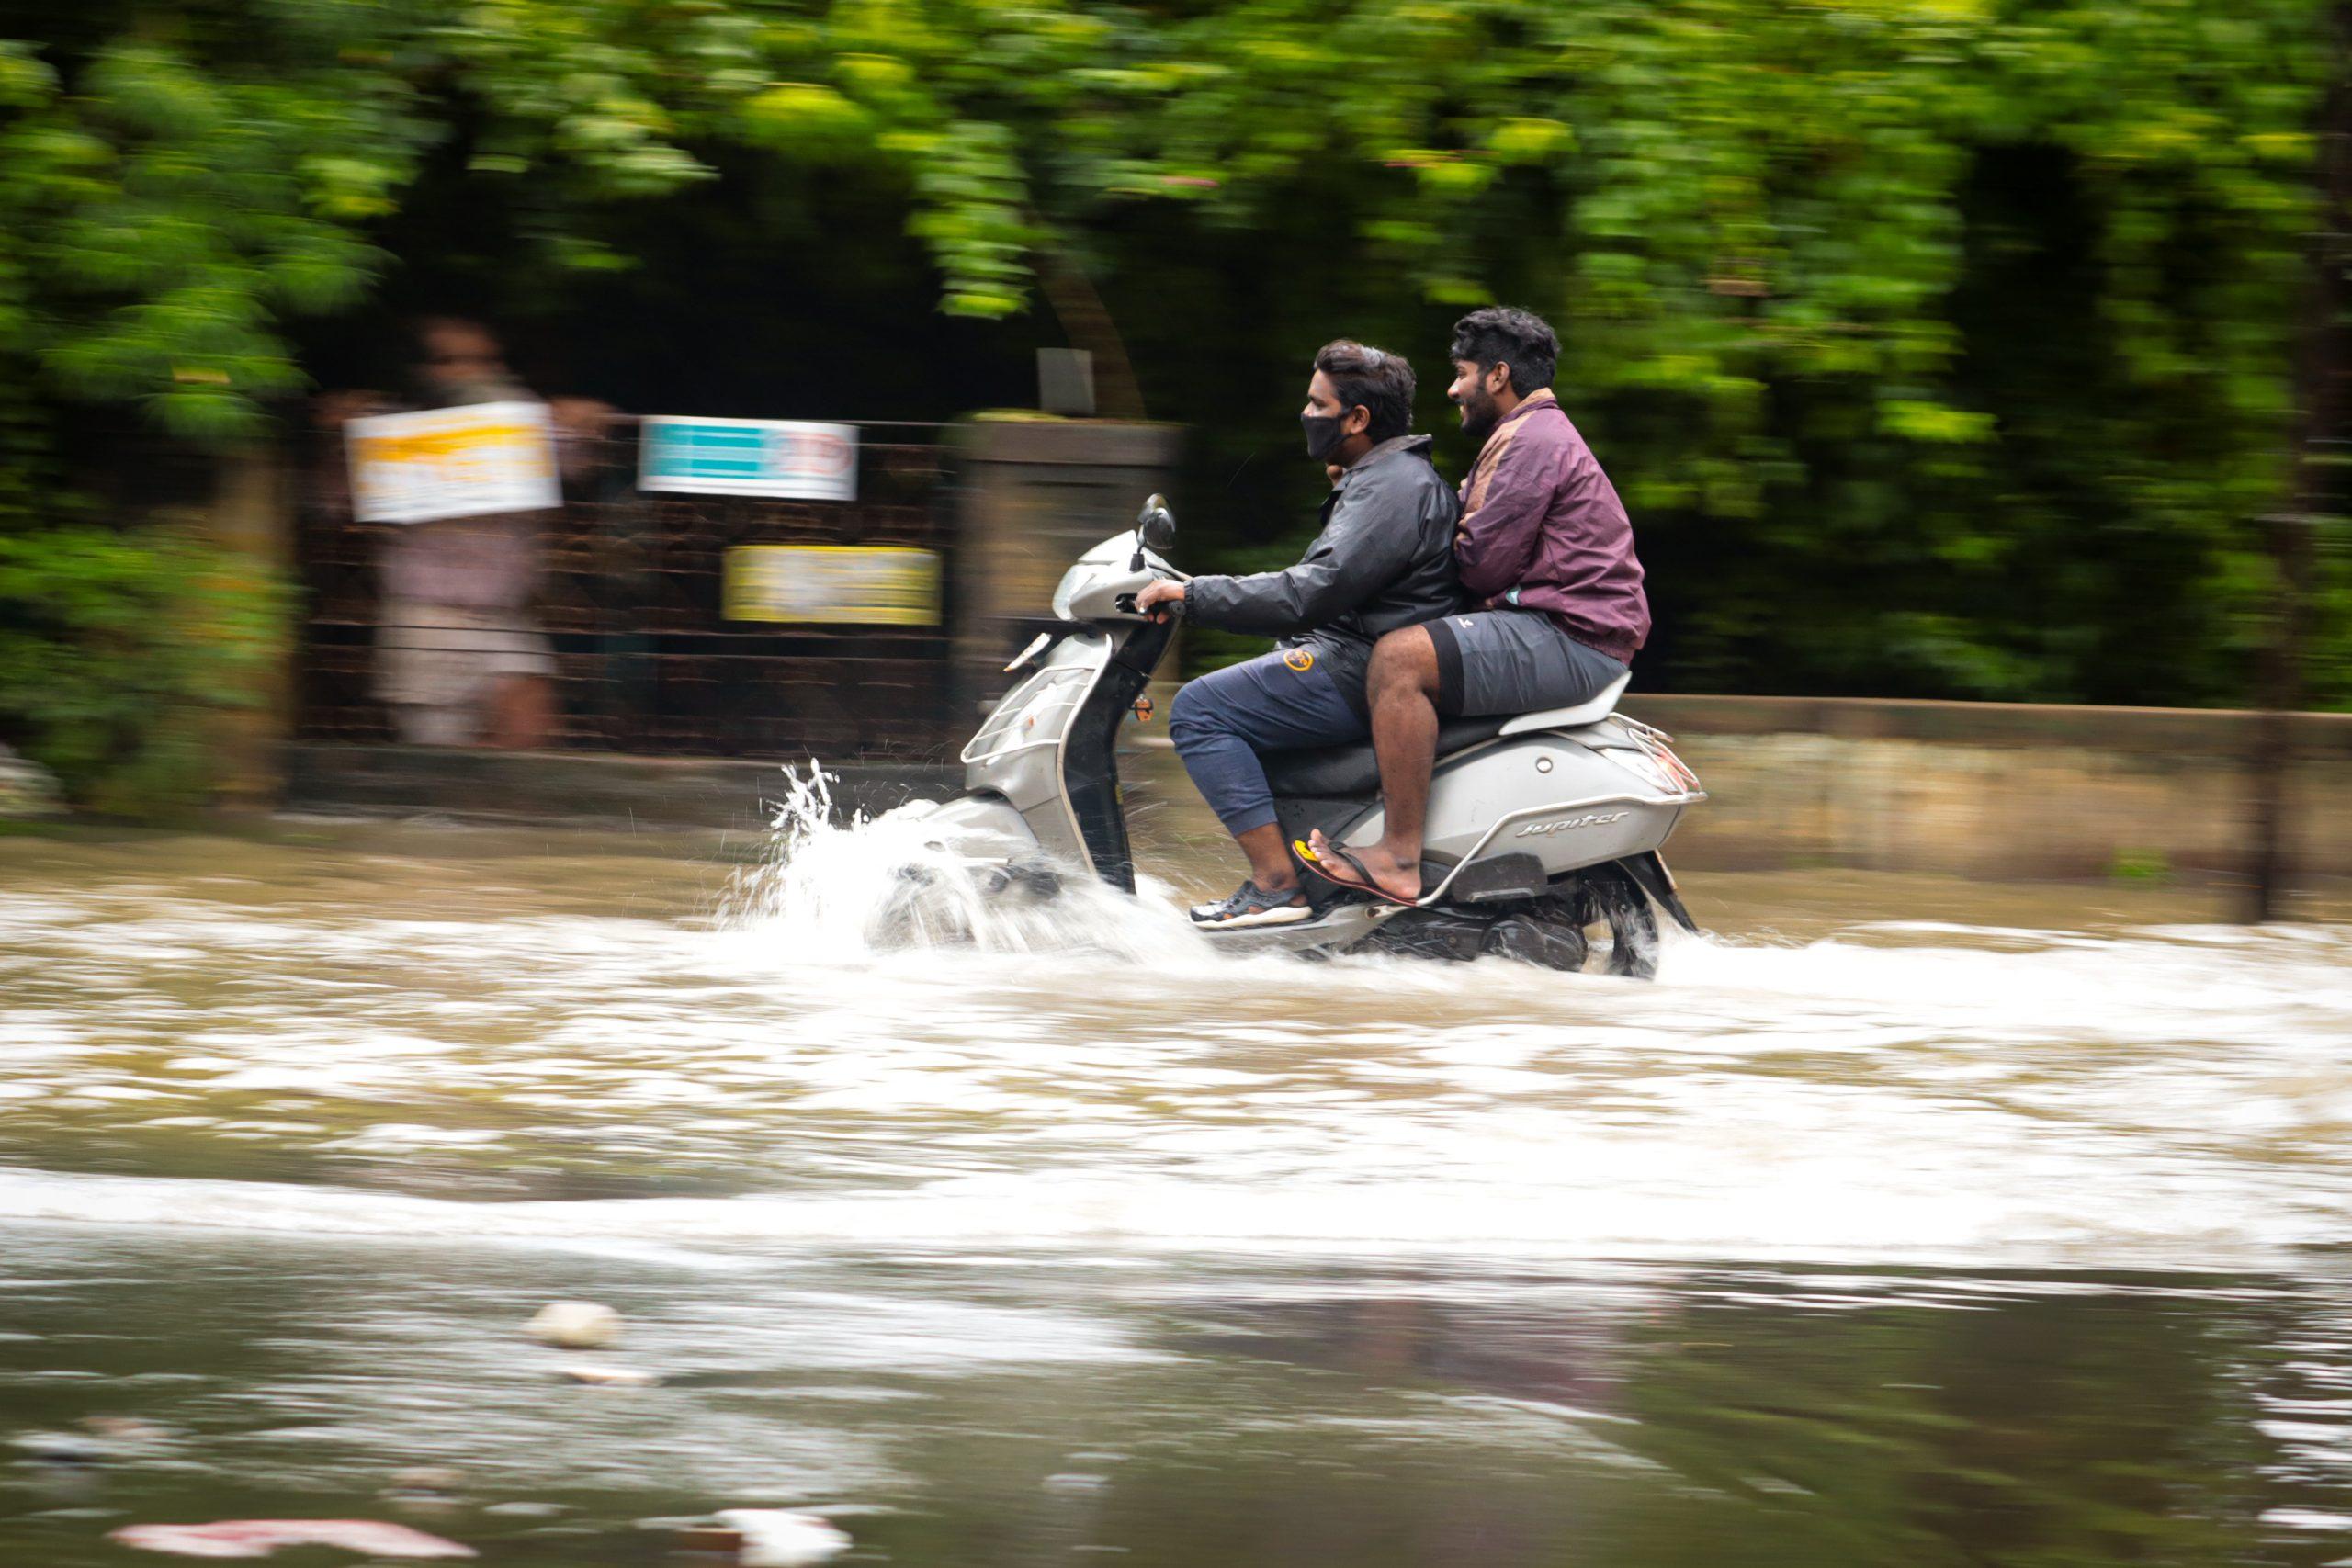 Driving through flood water